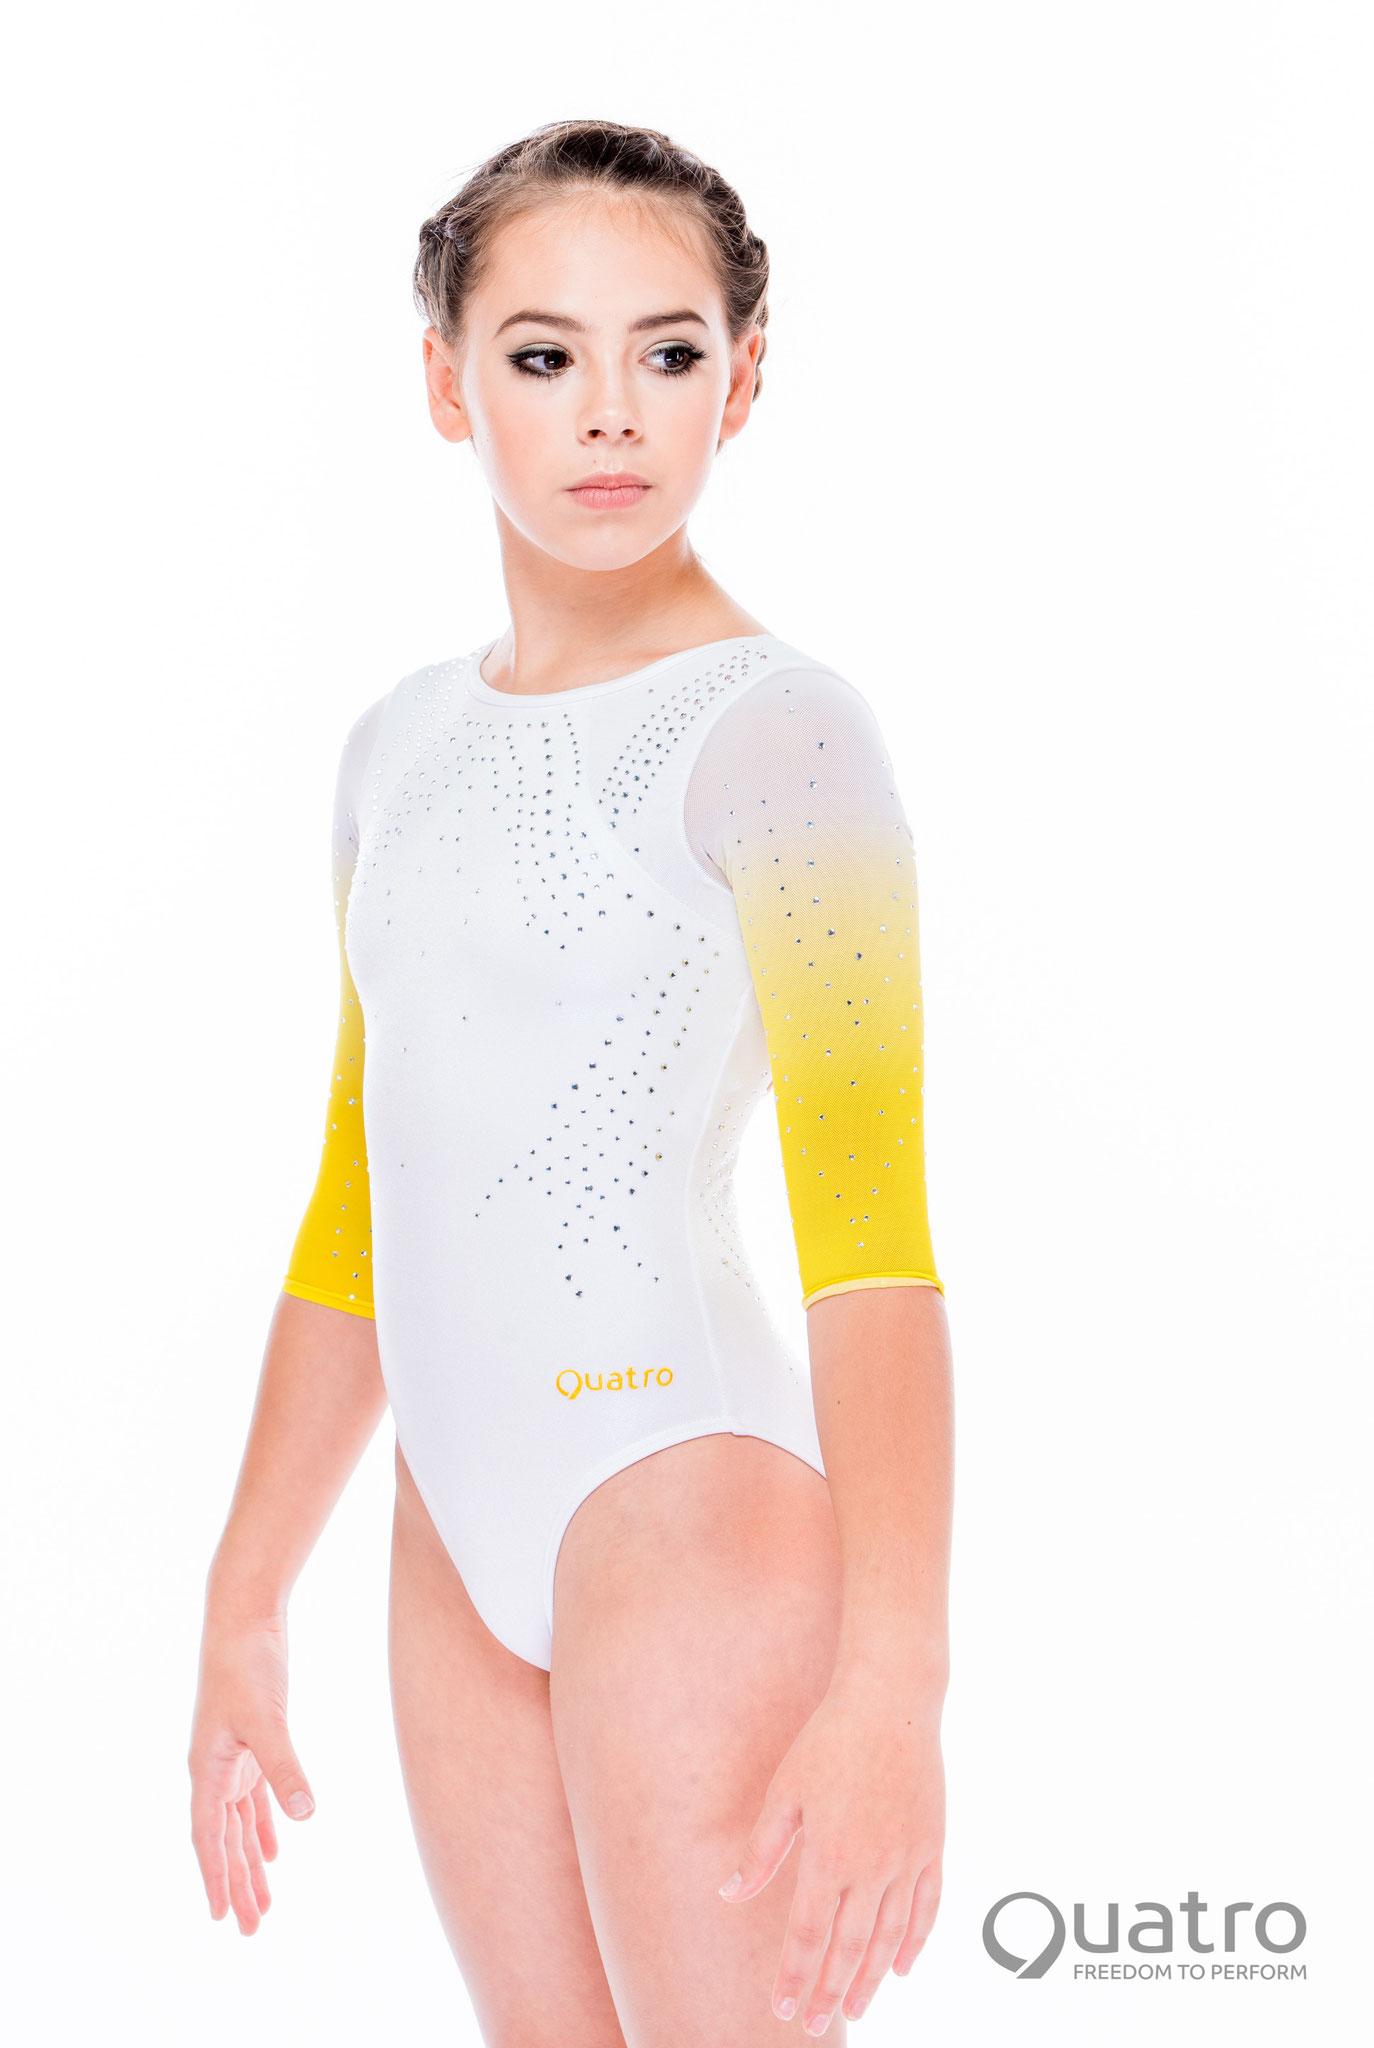 Quatro Bliss White and Yellow